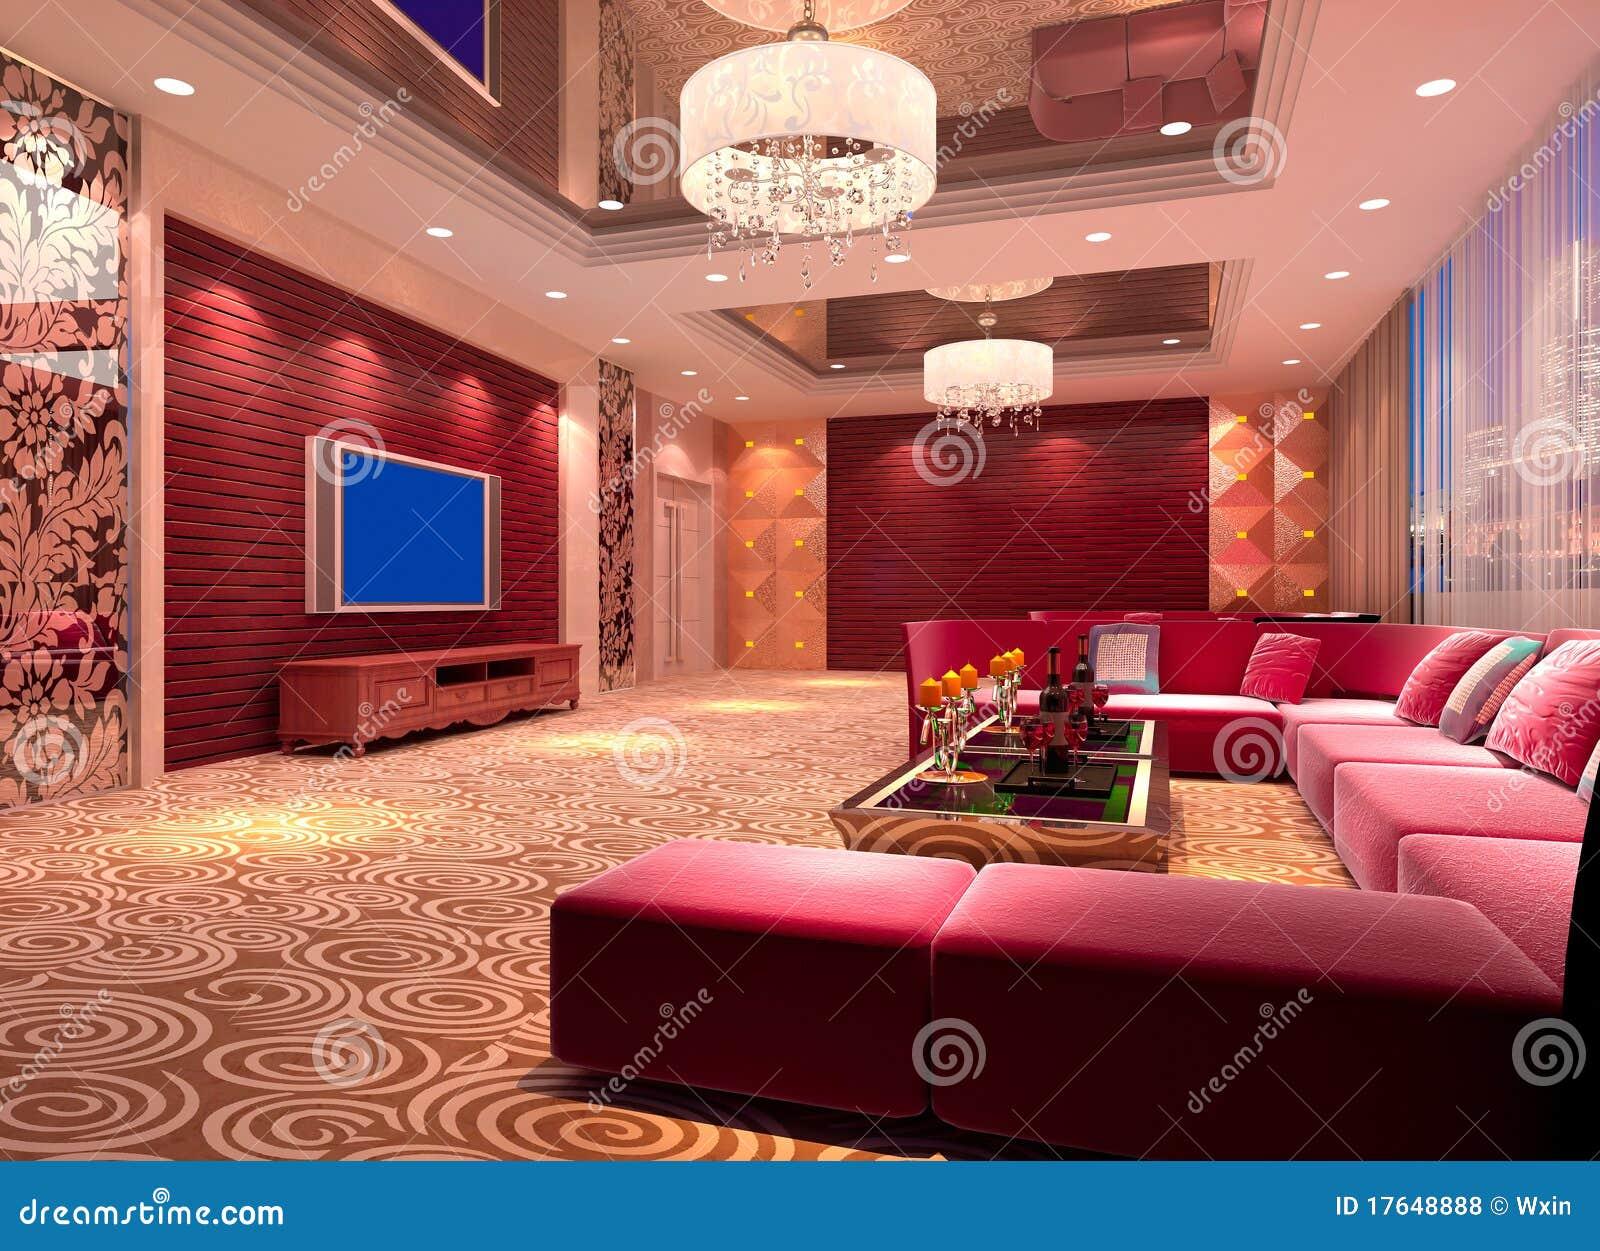 3d Club Room Hall Royalty Free Stock Photos Image 17648888